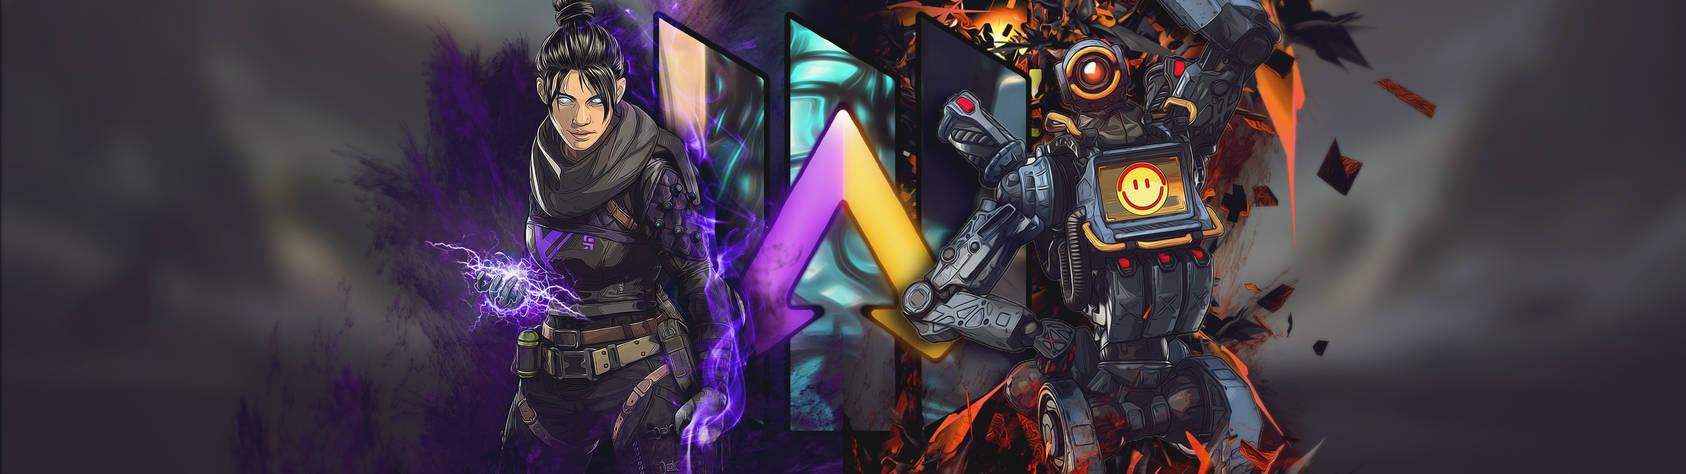 Apex Legends Wallpaper For Dual Monitor 3840x1080 By Gameriuxlt On Deviantart